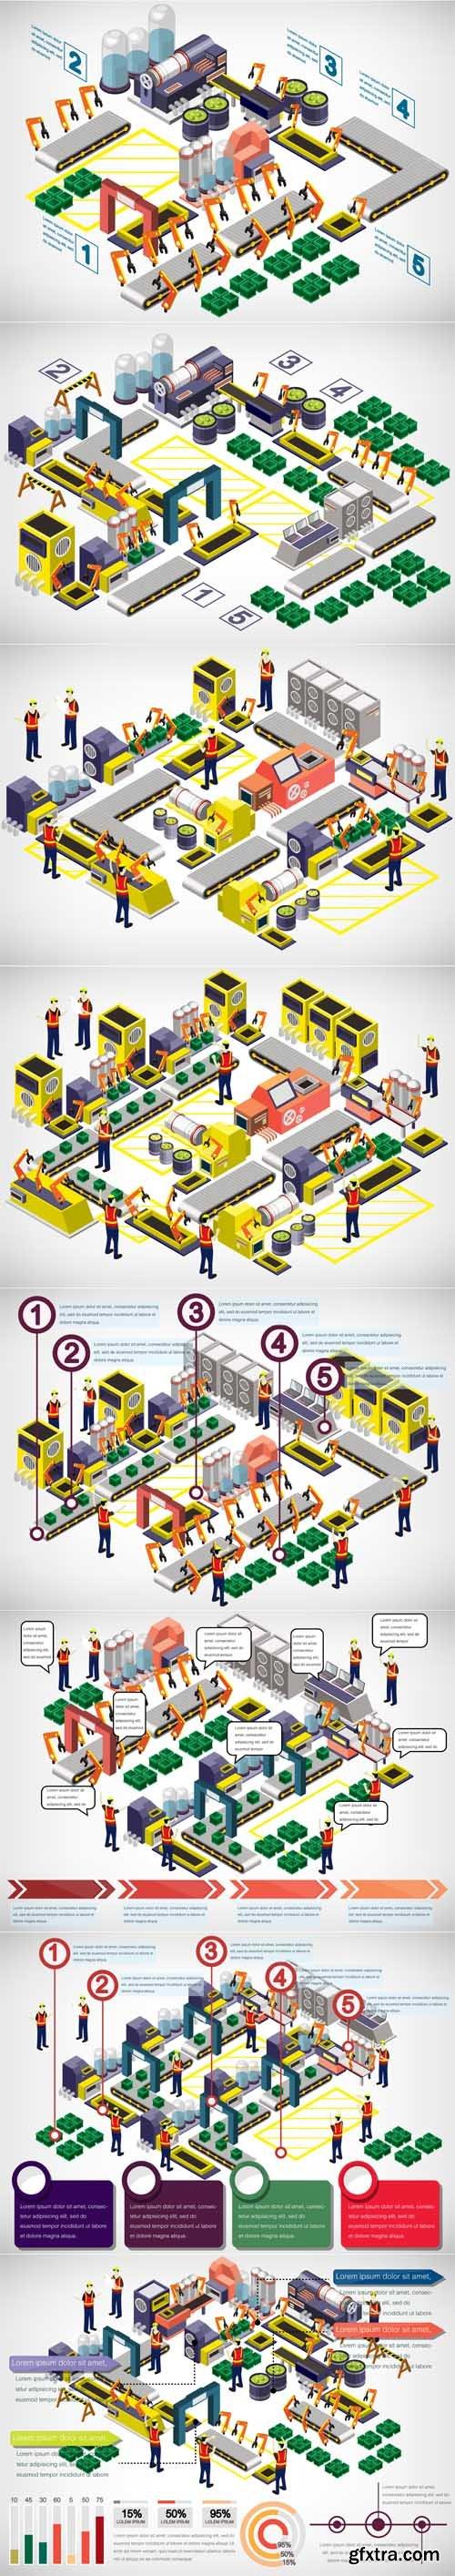 Illlustration of info graphic factory equipment concept - Vectors A000015